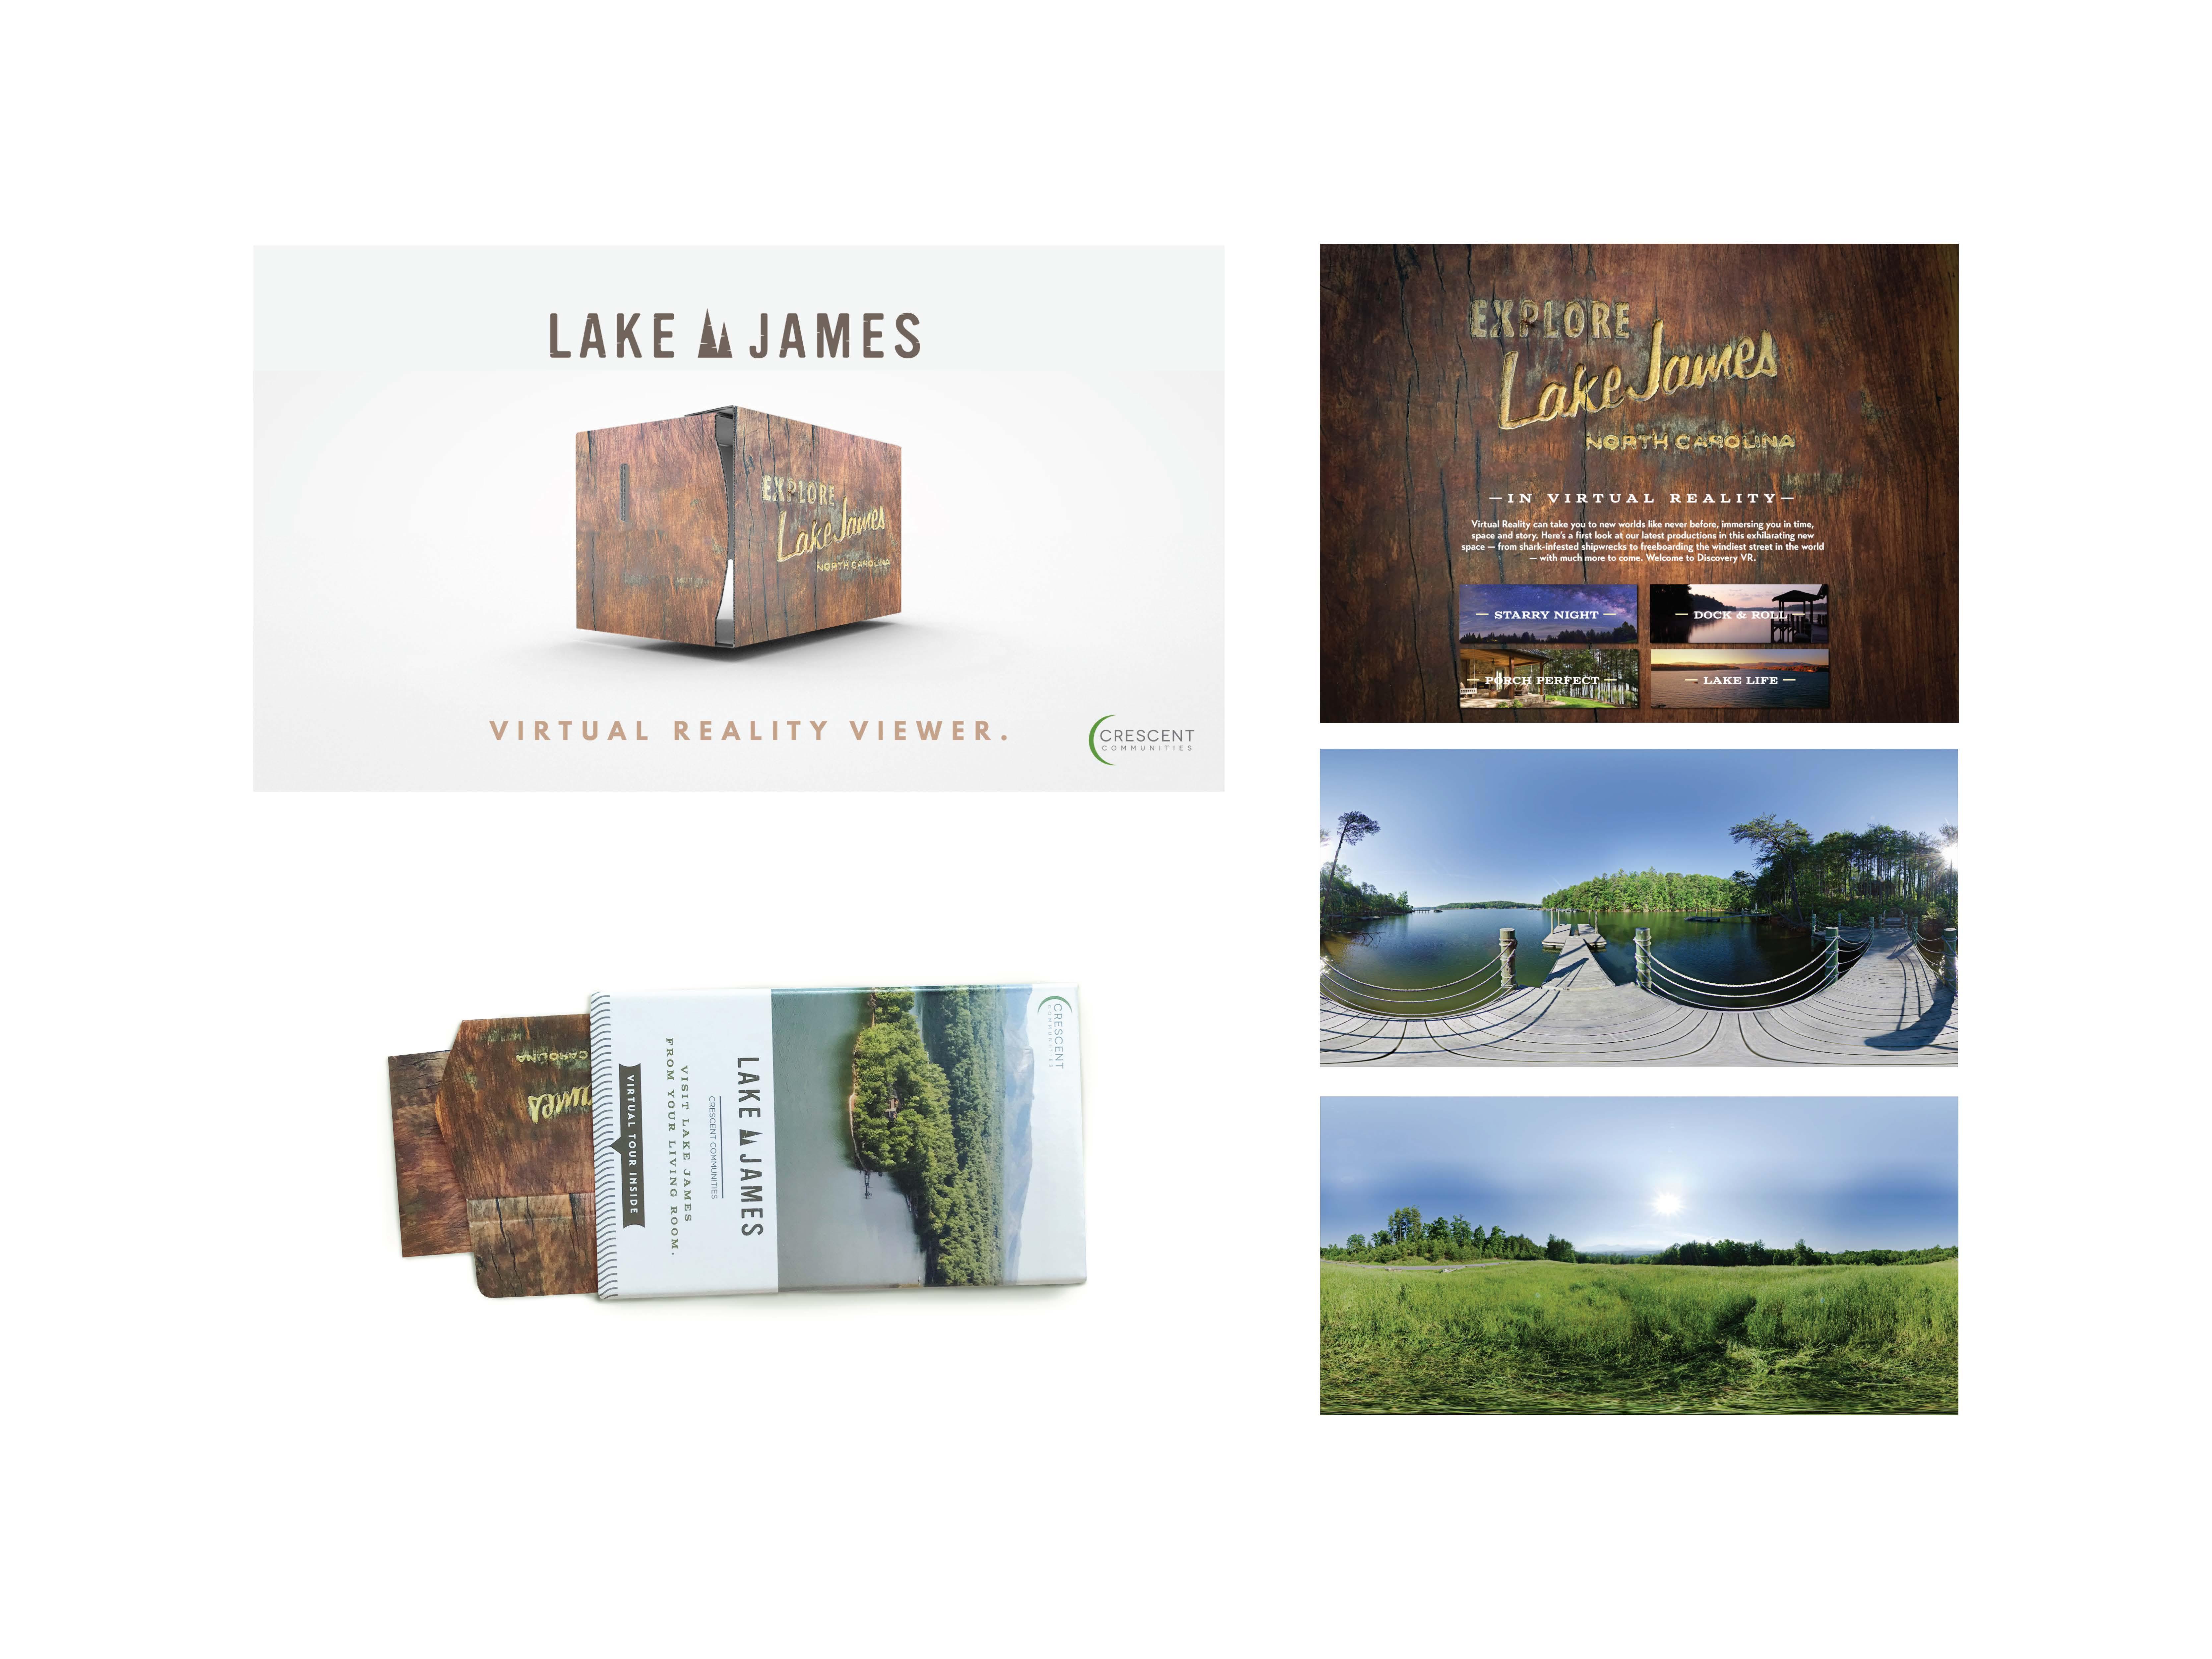 Lake James Content Marketing Compilation